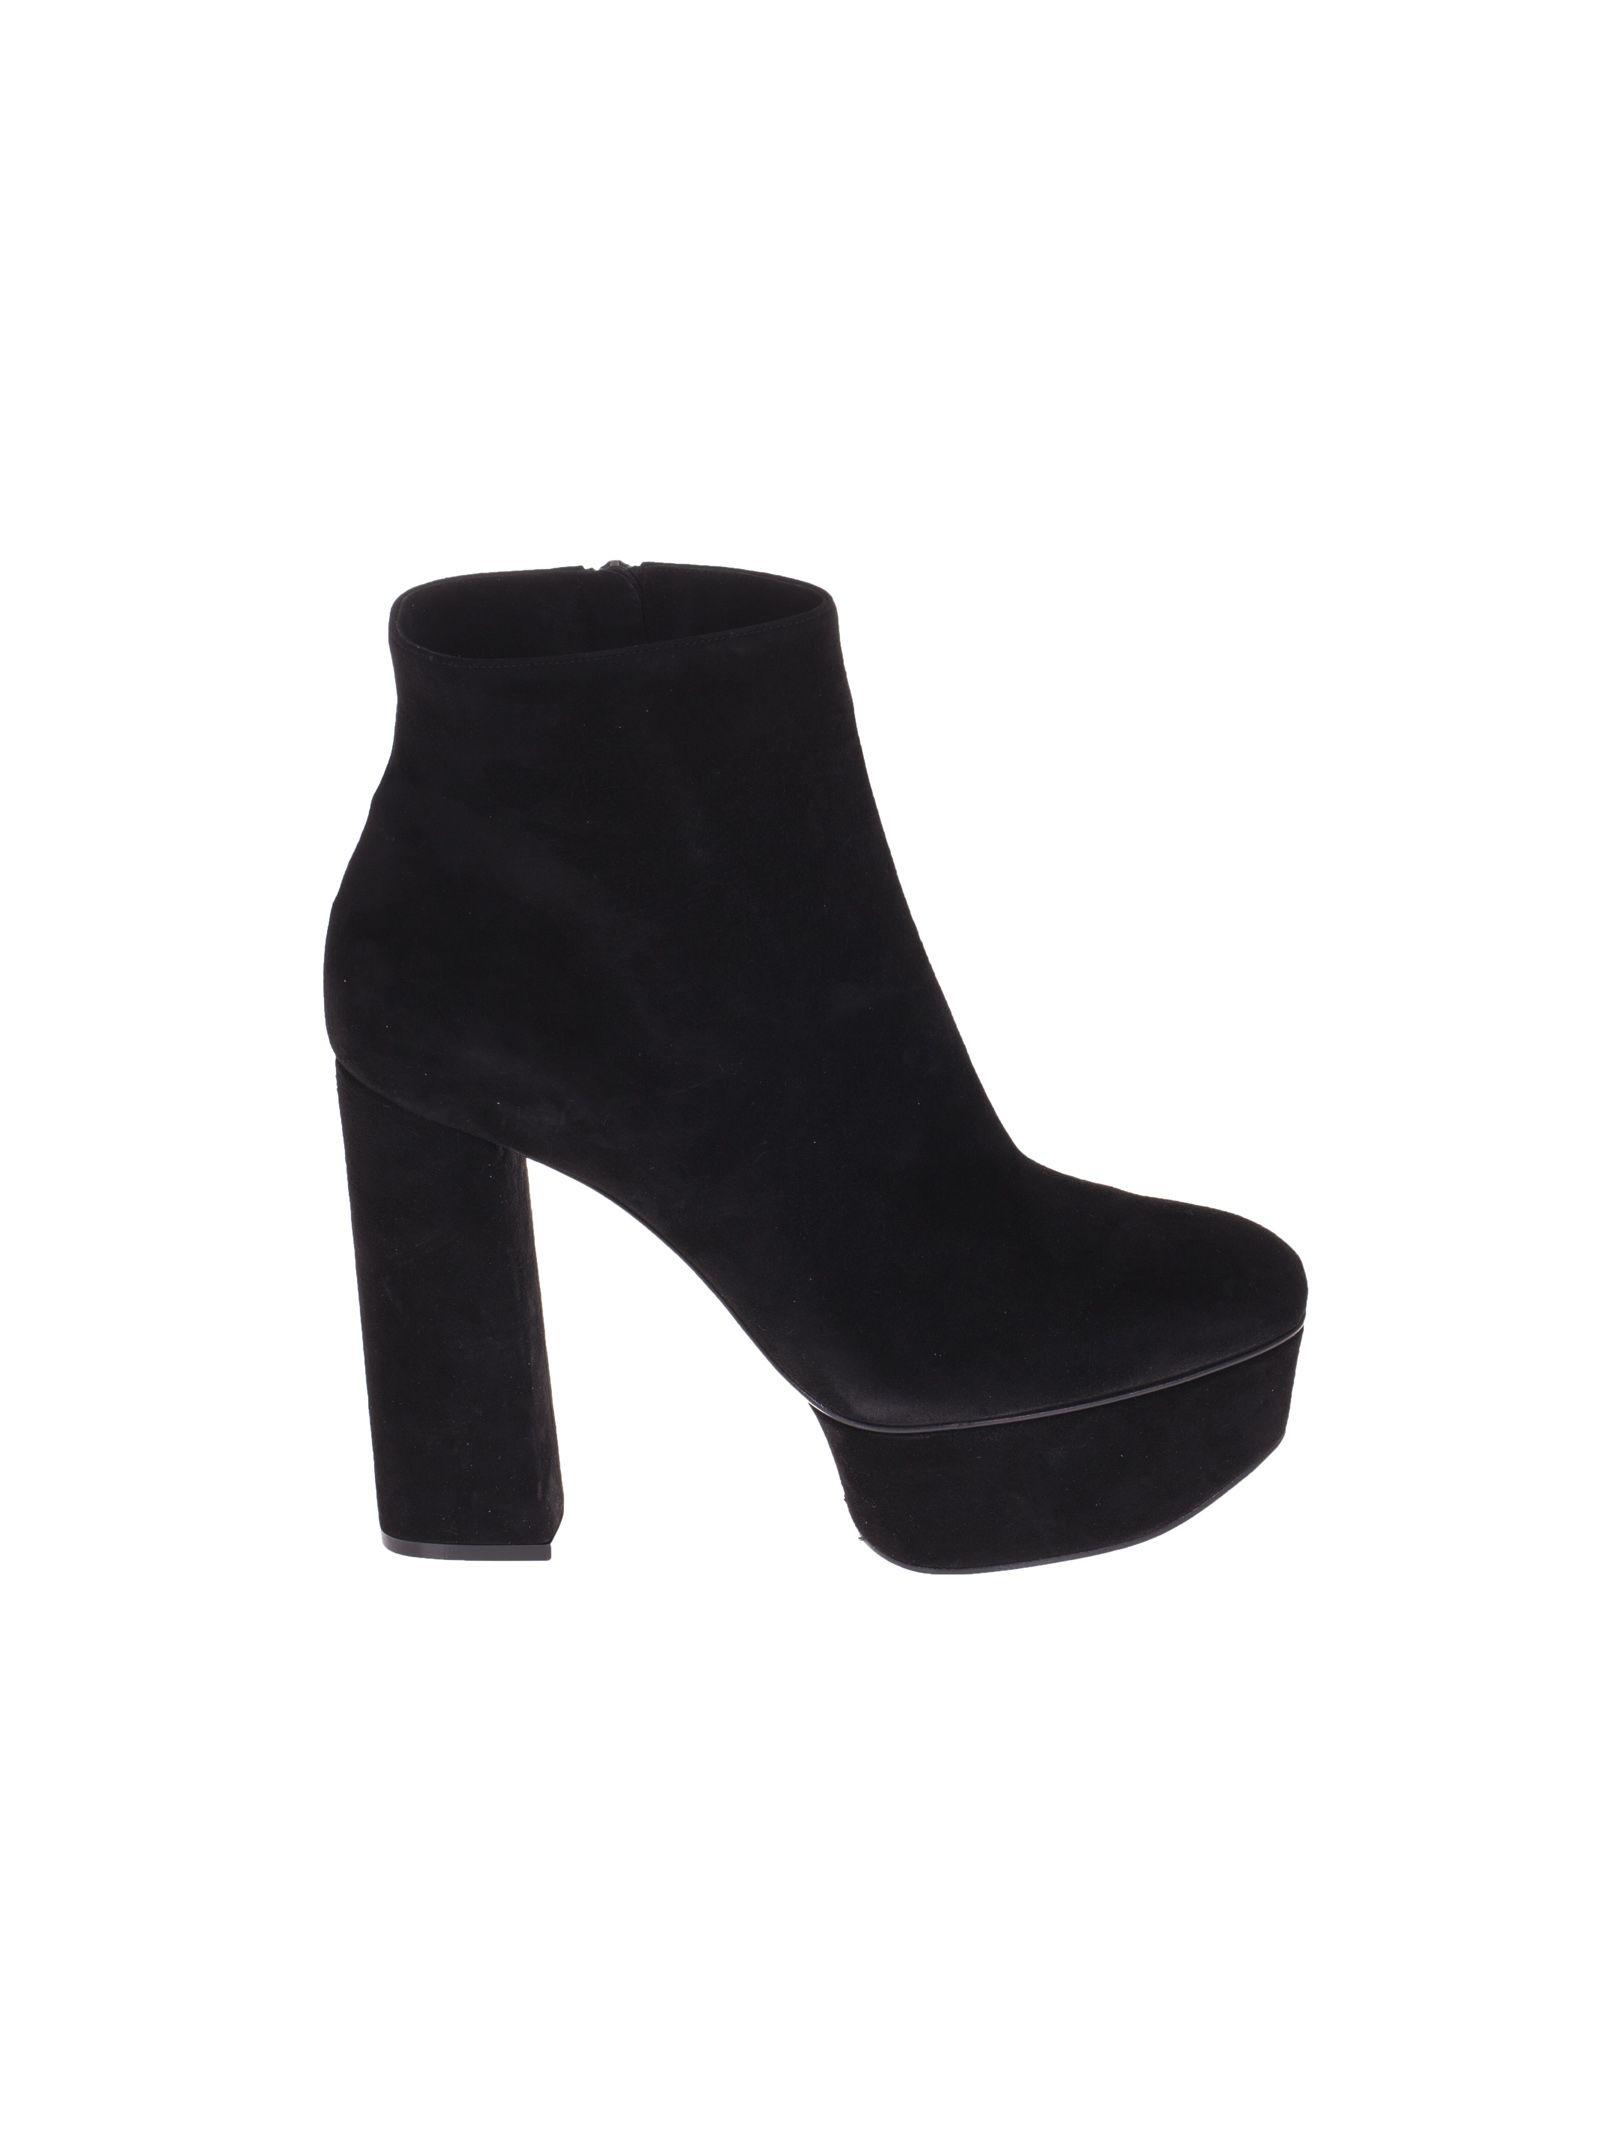 Casadei Platform Ankle Boots - Casadei - Jake